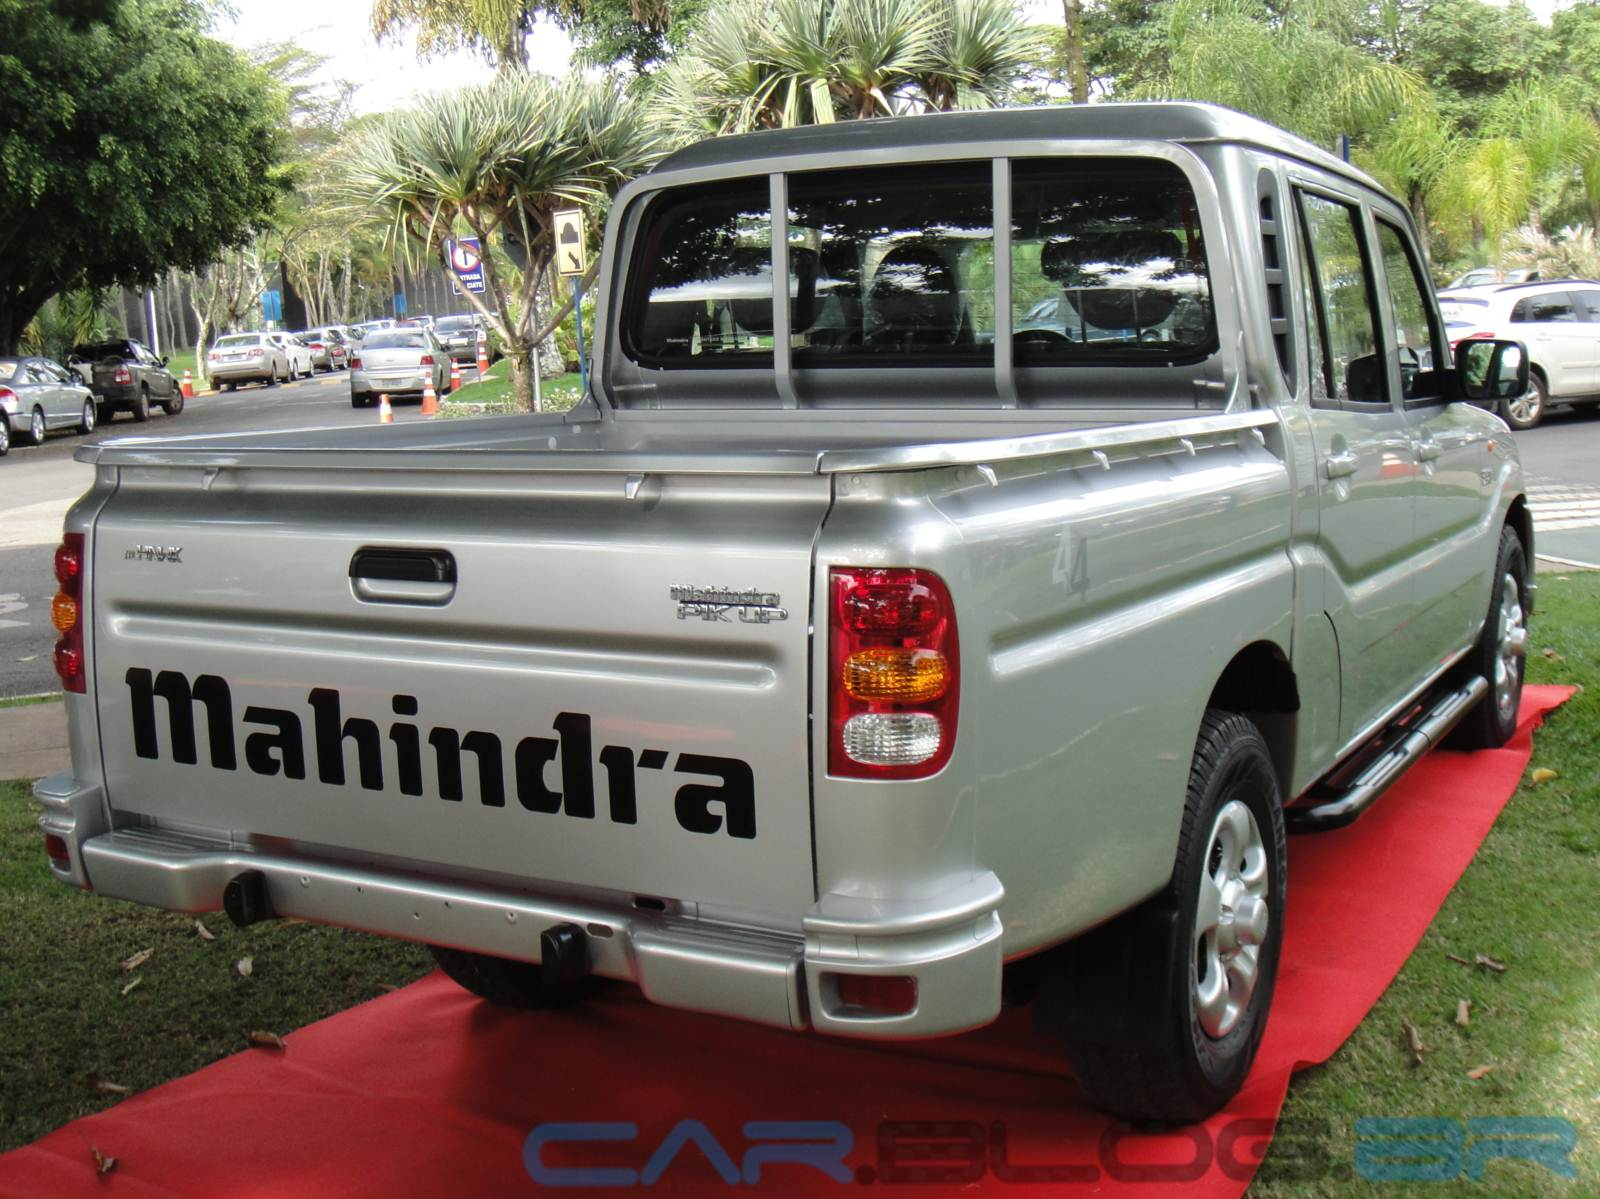 mahindra pick up 2 6 turbo diesel 4x4 tem pre o de r reais car blog br. Black Bedroom Furniture Sets. Home Design Ideas